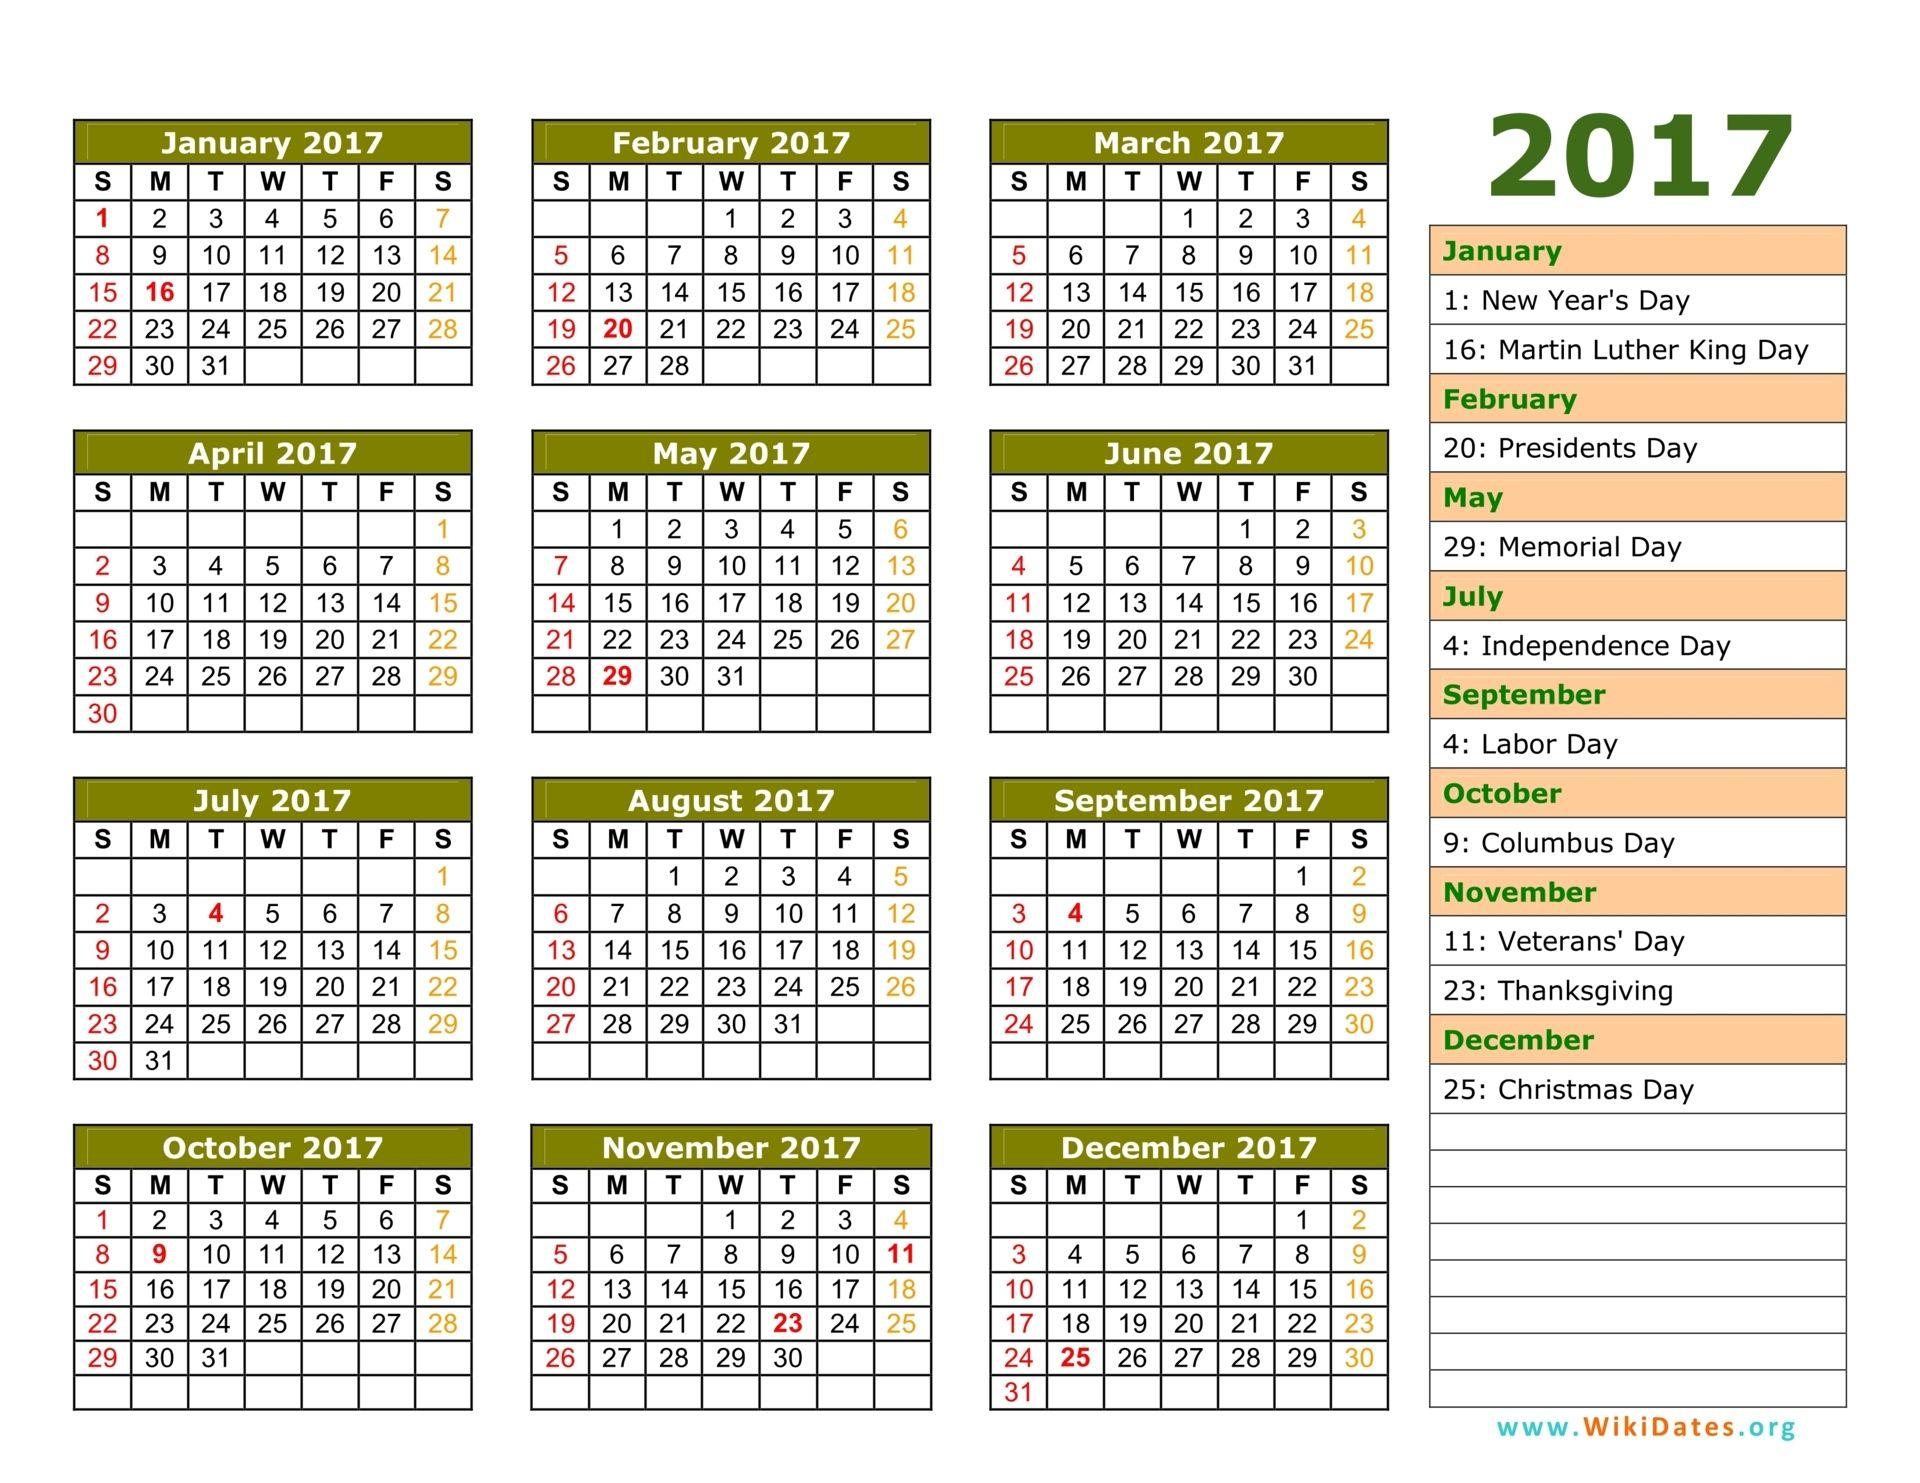 2017 Calendar With Holidays | 2017 Calendar With Holidays